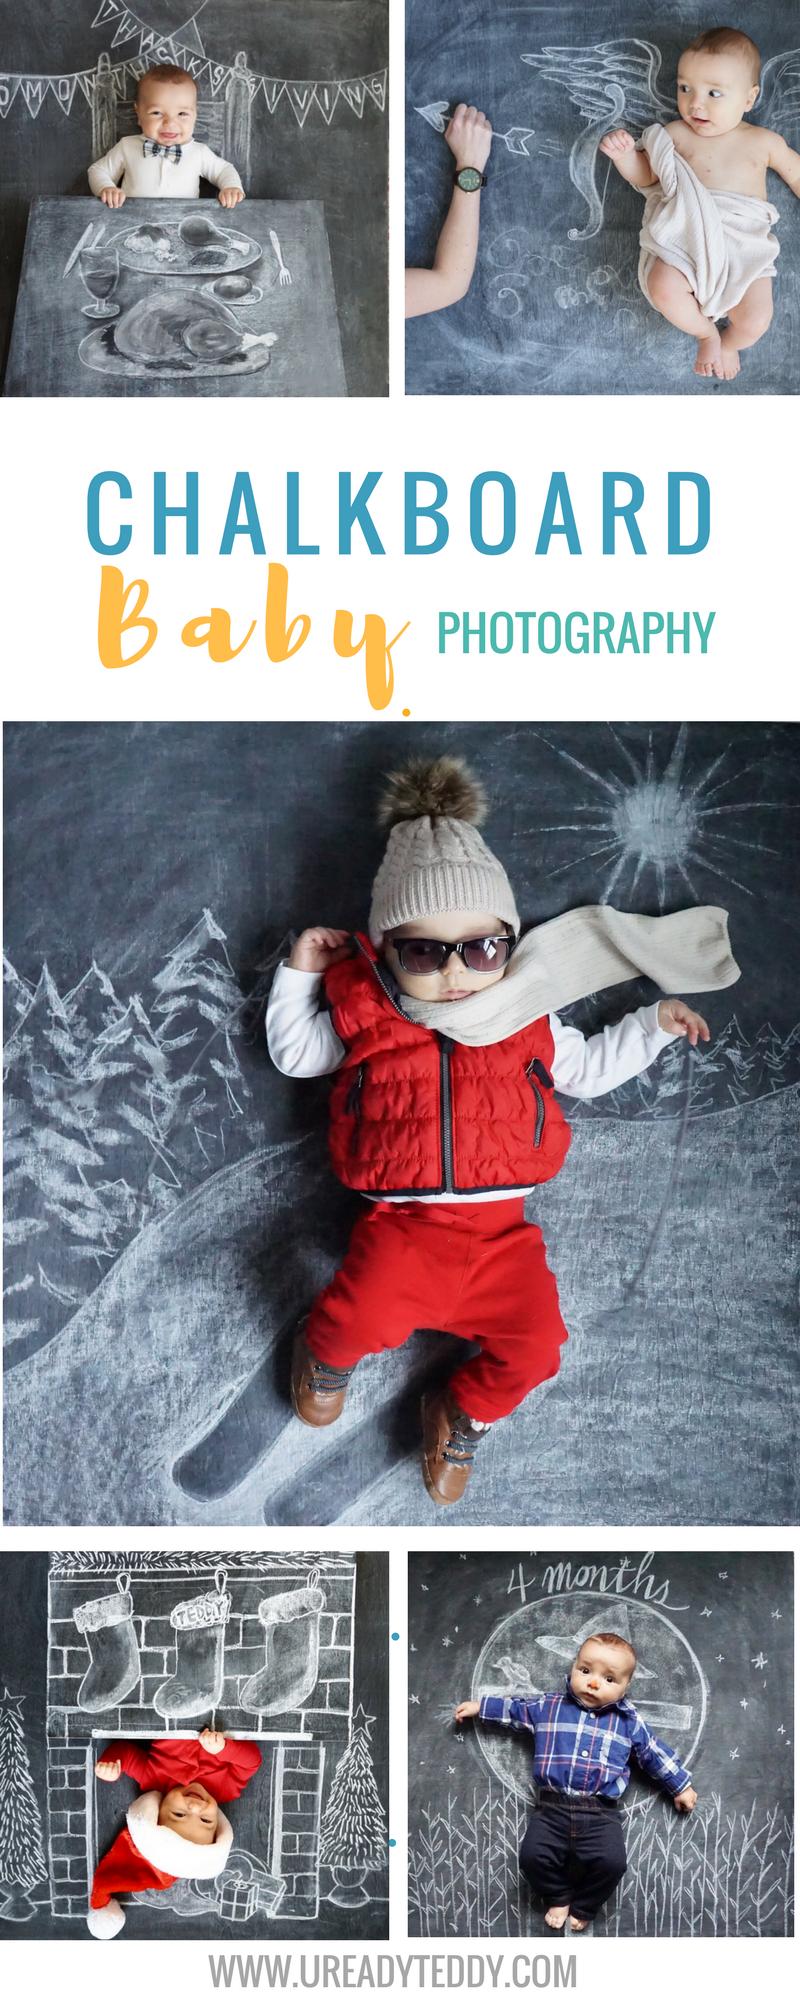 Chalkboard Baby Photography. Creative Newborn Photos. Funny Baby Pics. Nezo Art. Chalk Art. Blackboard Art. Monthly Baby Milestone Photos.